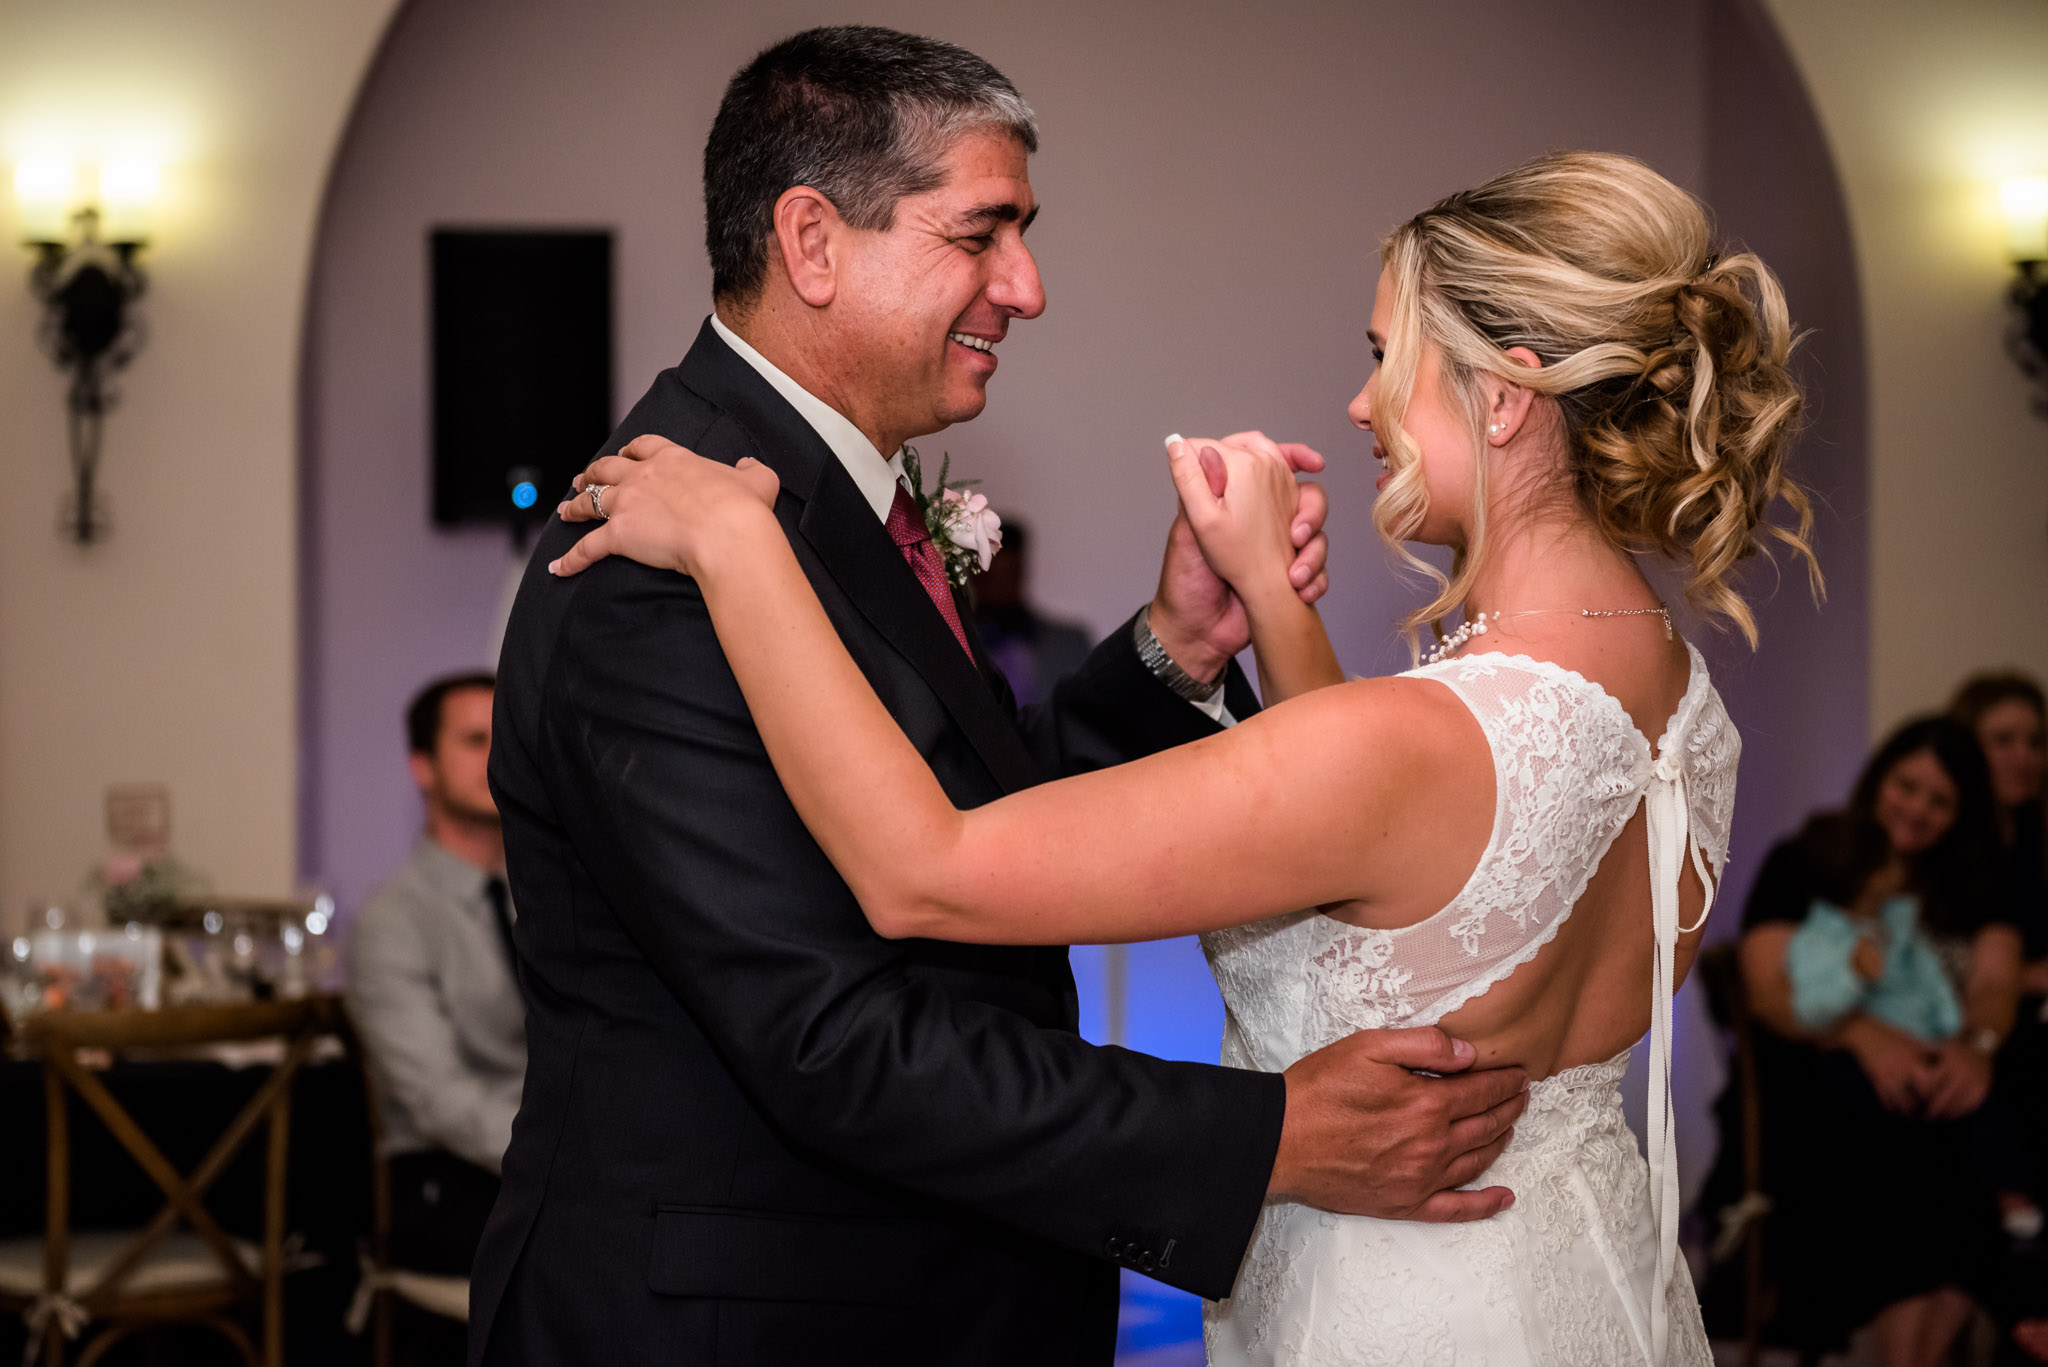 Avensole-Winery-Temecula-Wedding-Josh-and-Olivia-4062.JPG